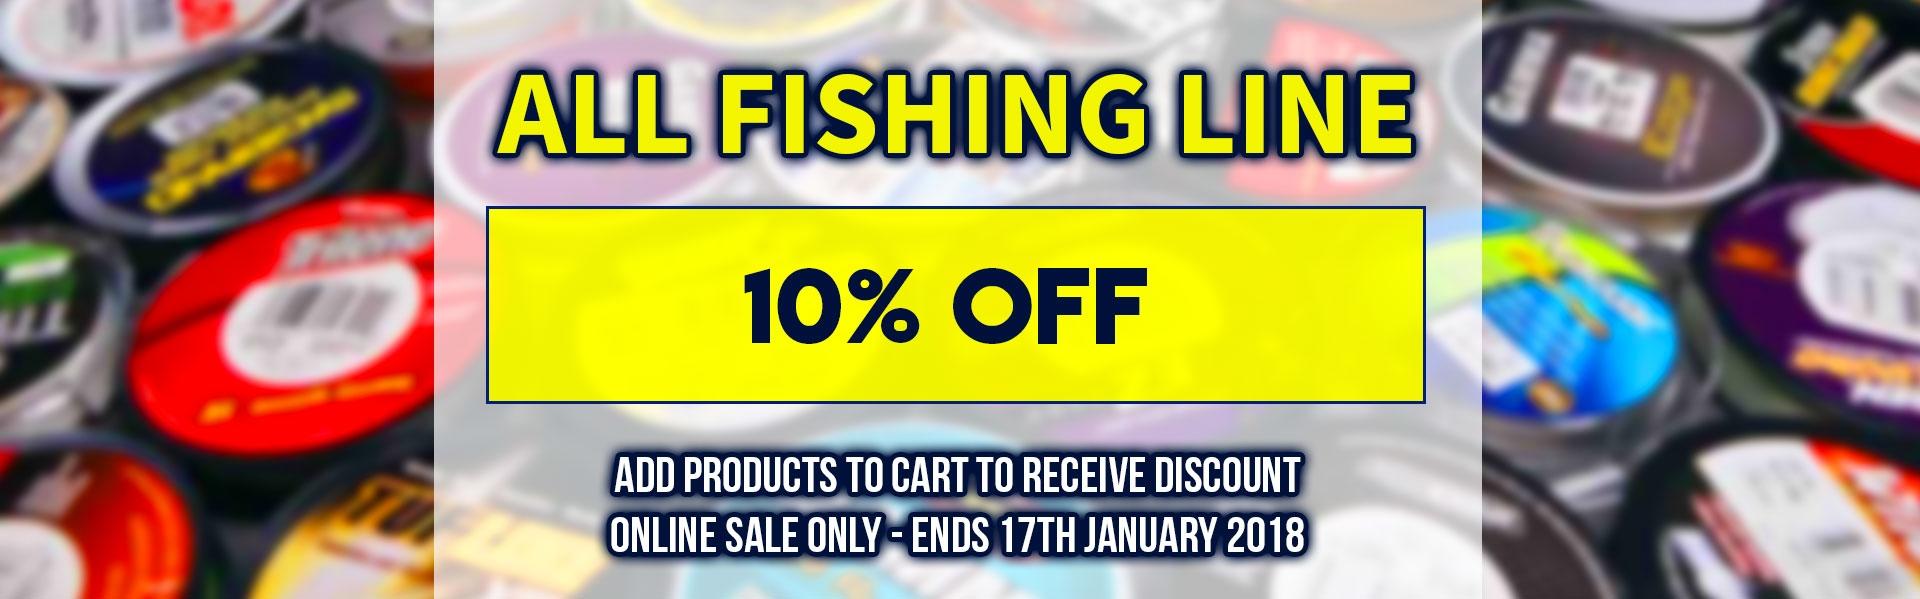 10% of Fishing Line